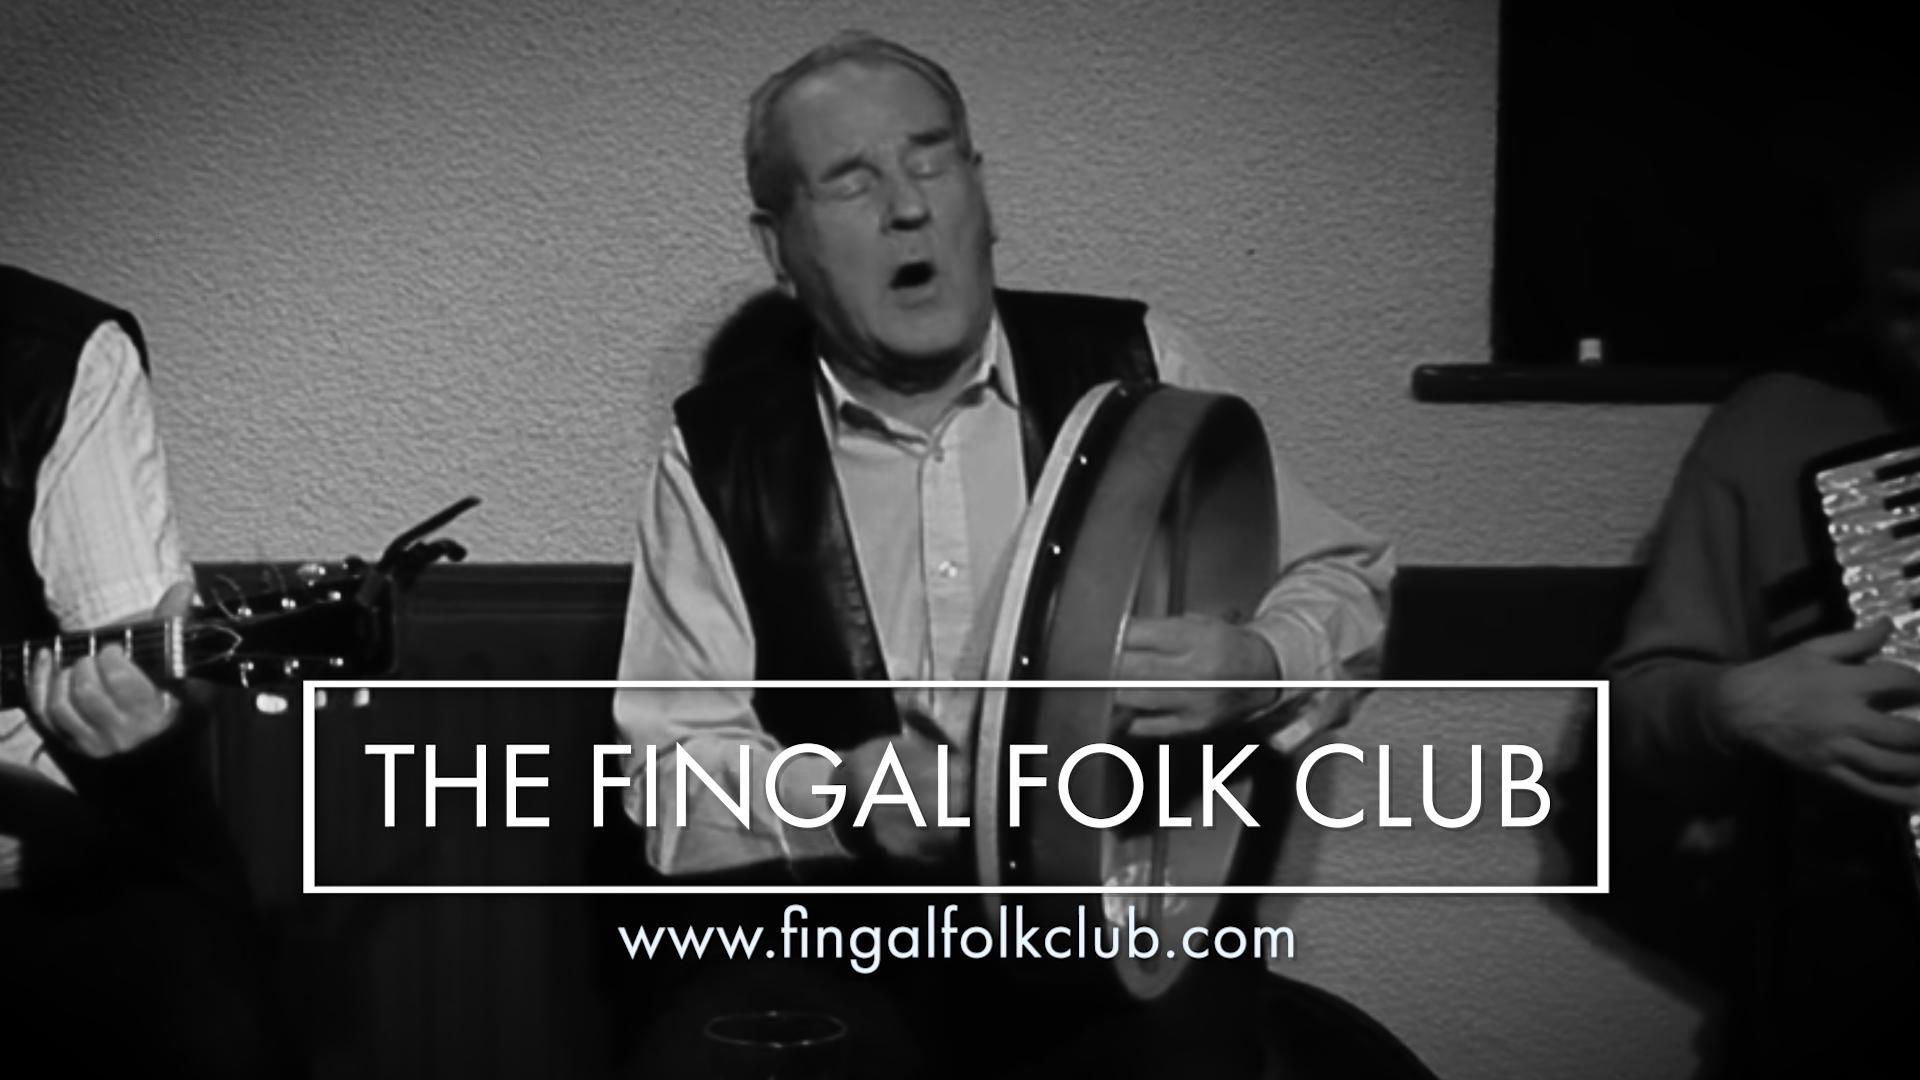 Fingal Folk CLub Event Video 2